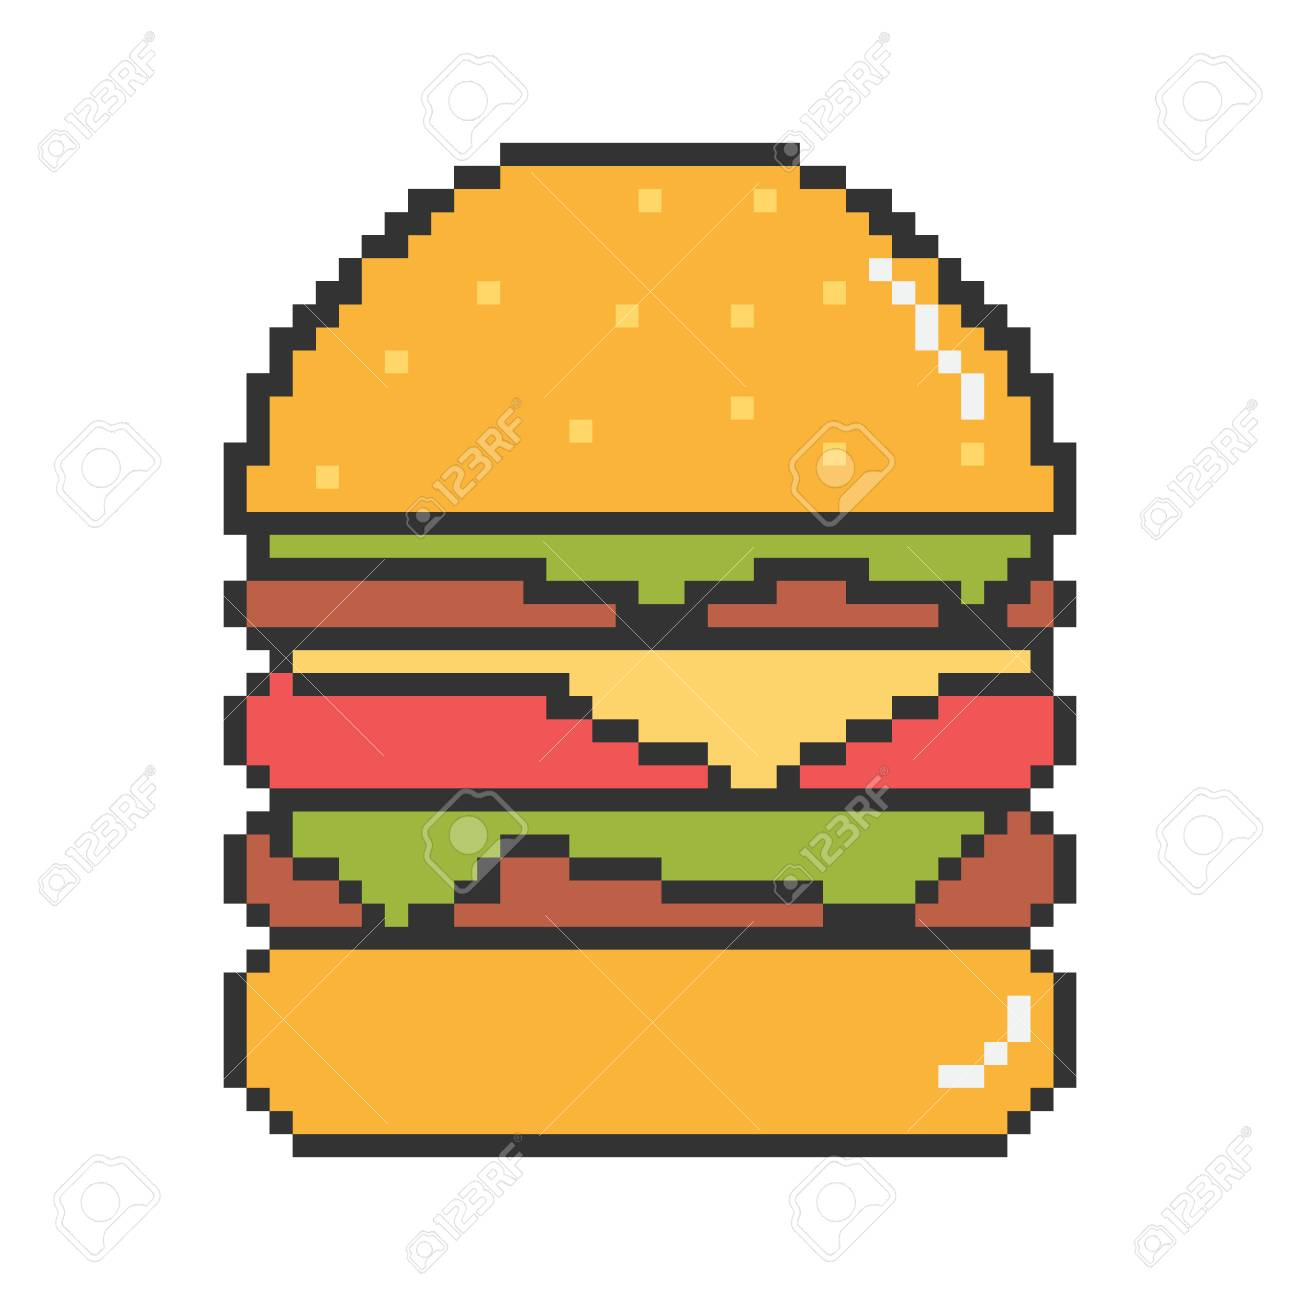 Vector Pixel Art 8bit Illustration Of A Burger With Black Stroke